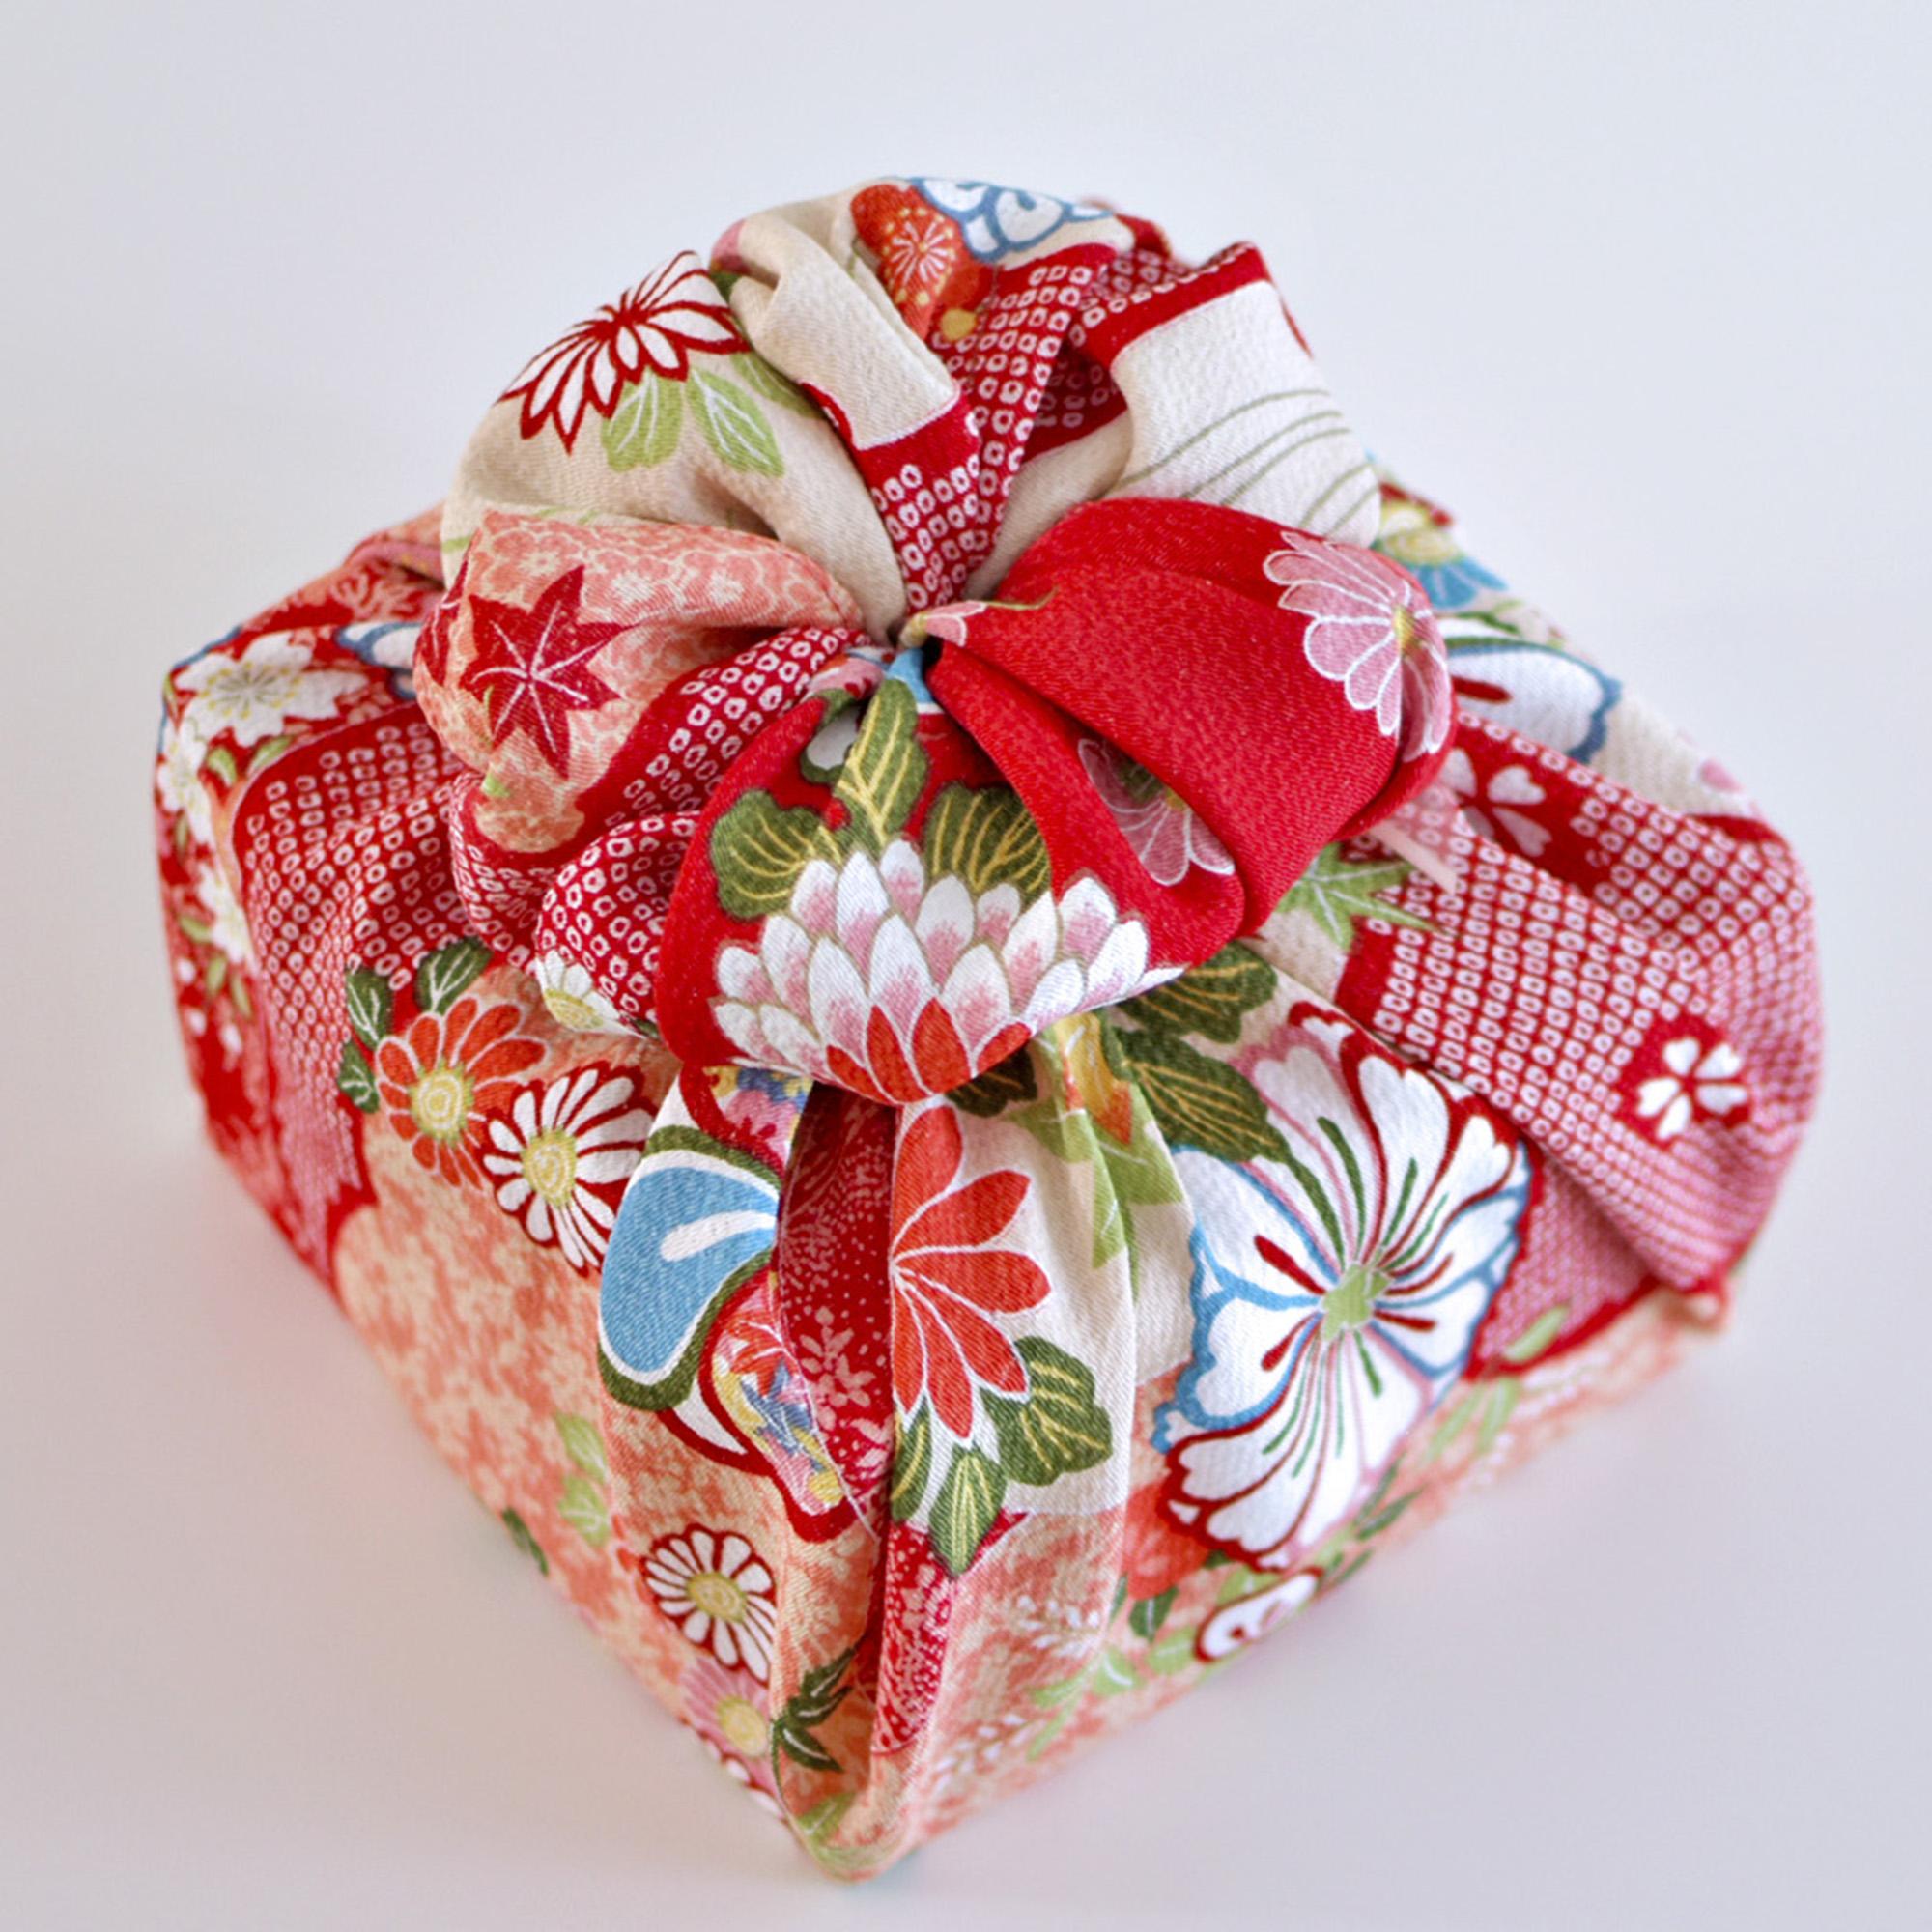 Double blossom Furoshiki wrapping design